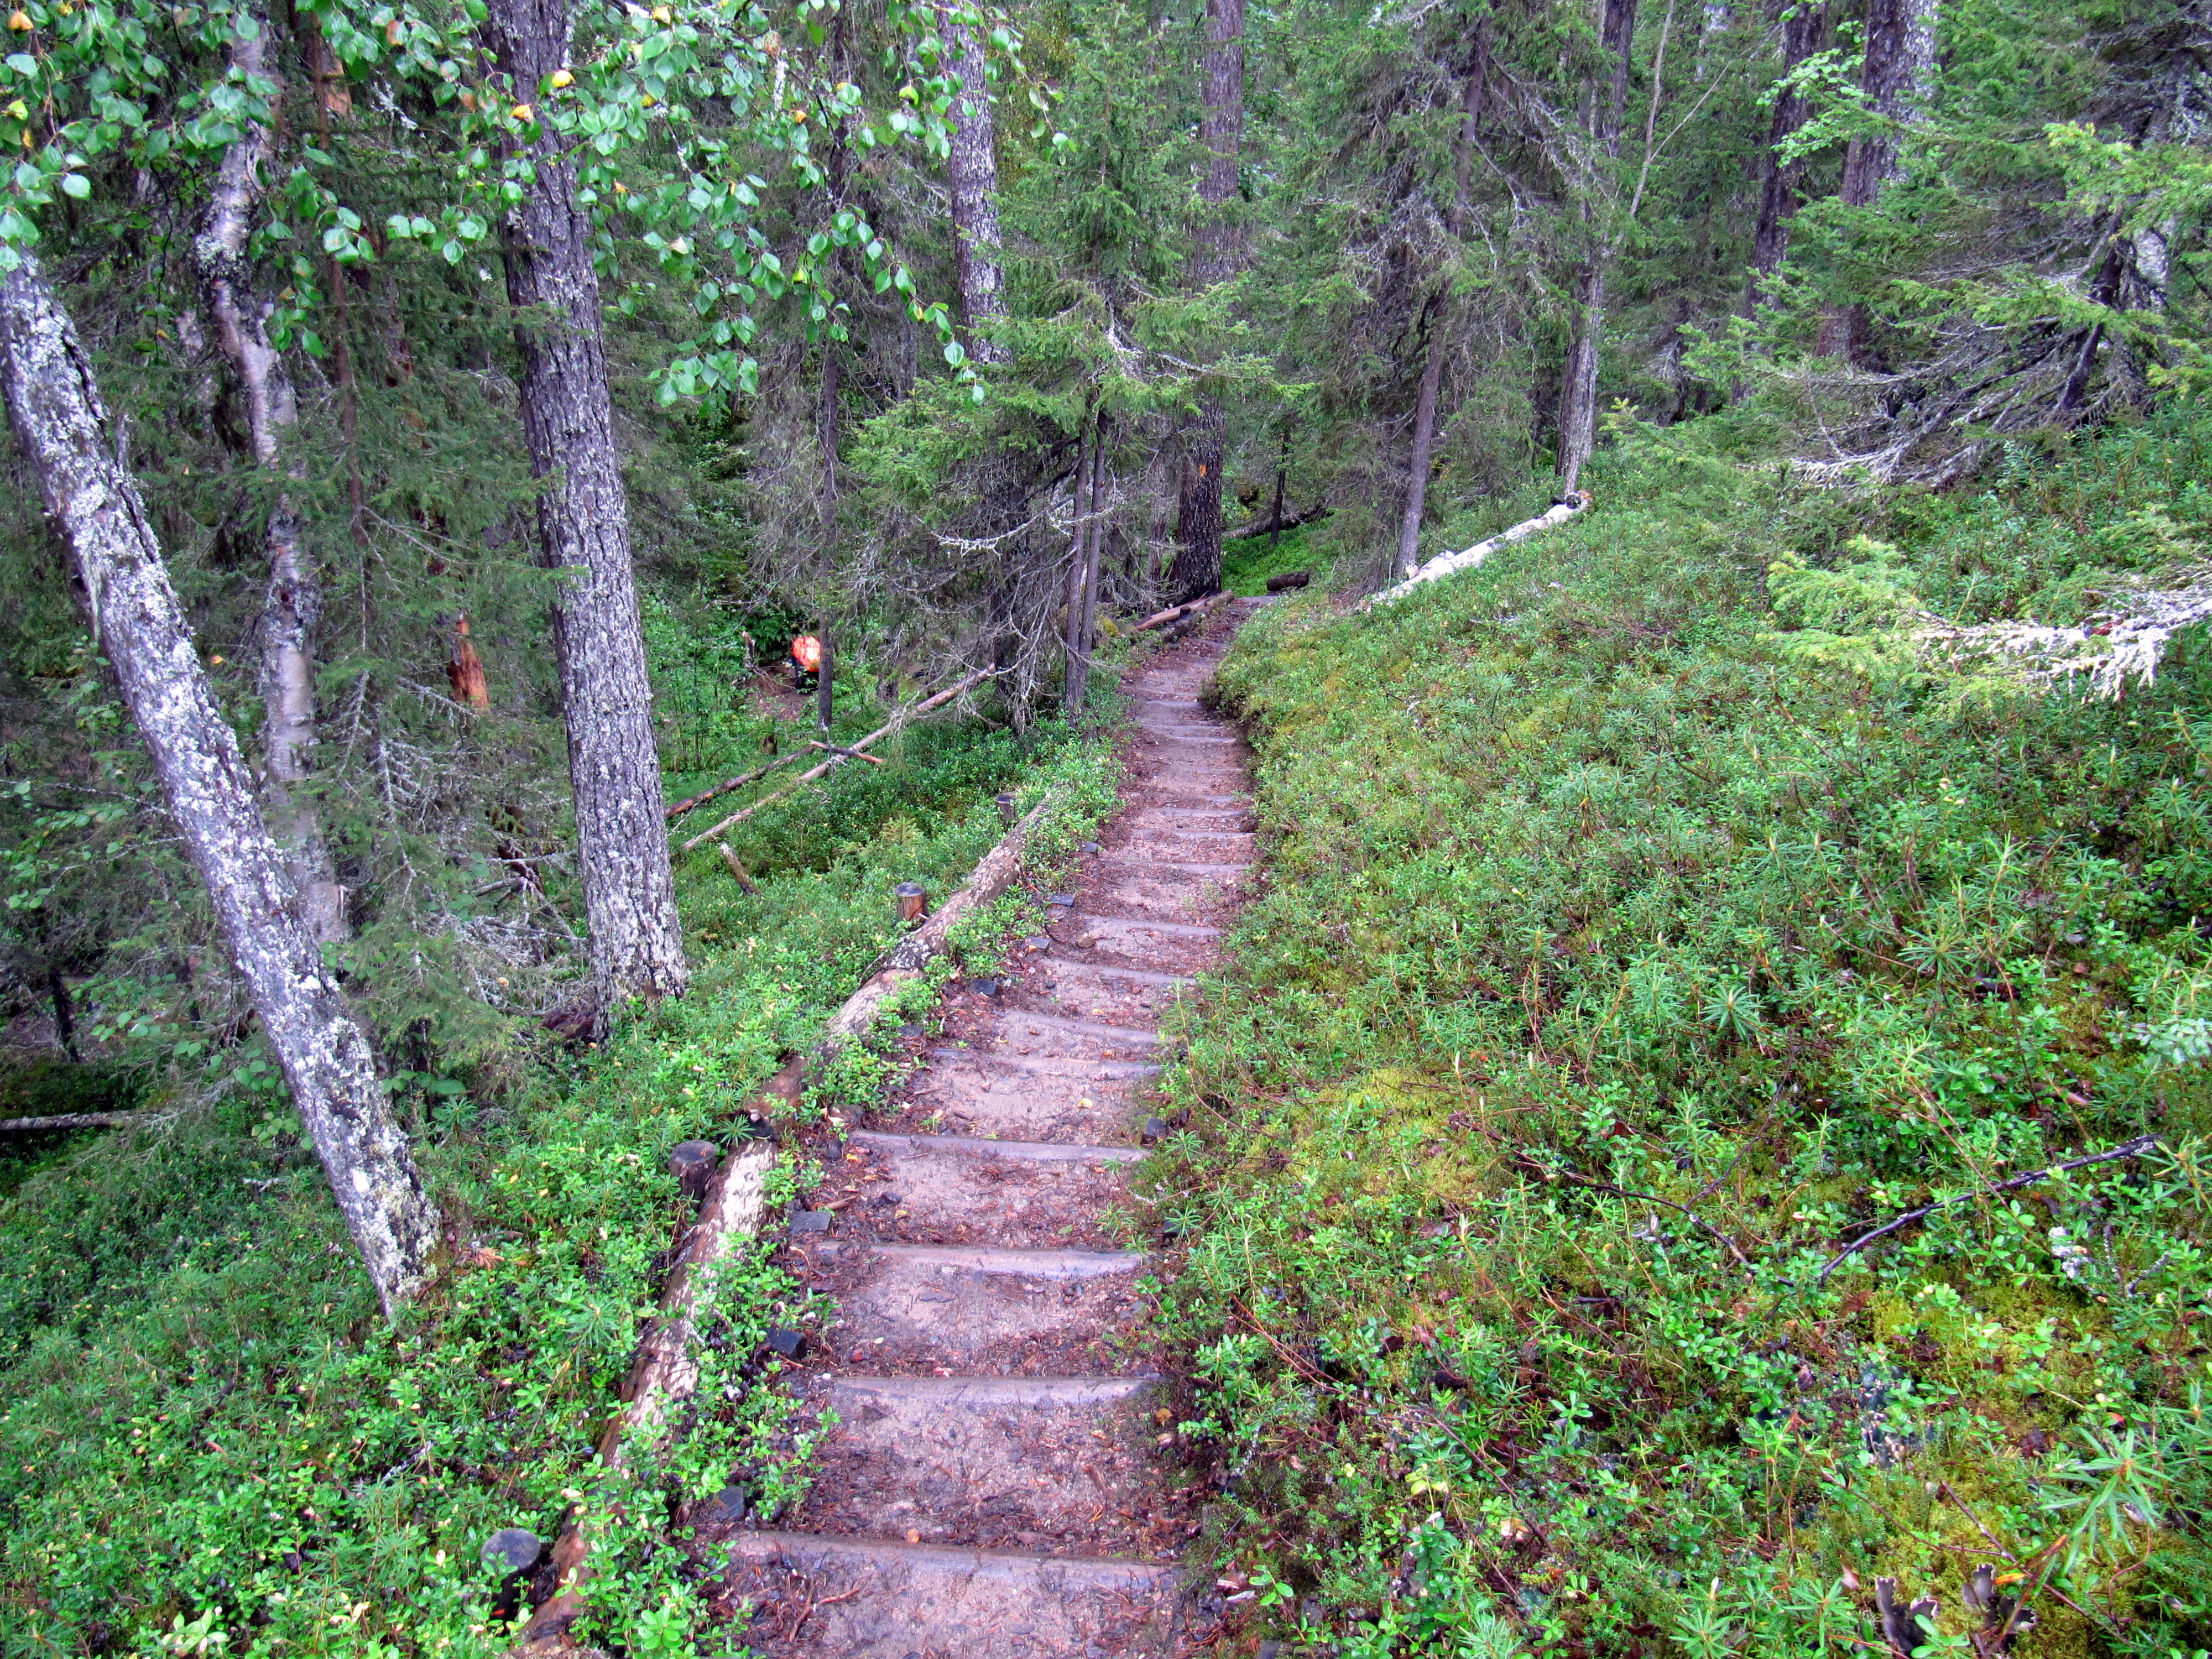 File:80km Karhunkierros Hiking Trail.jpg - Wikimedia Commons